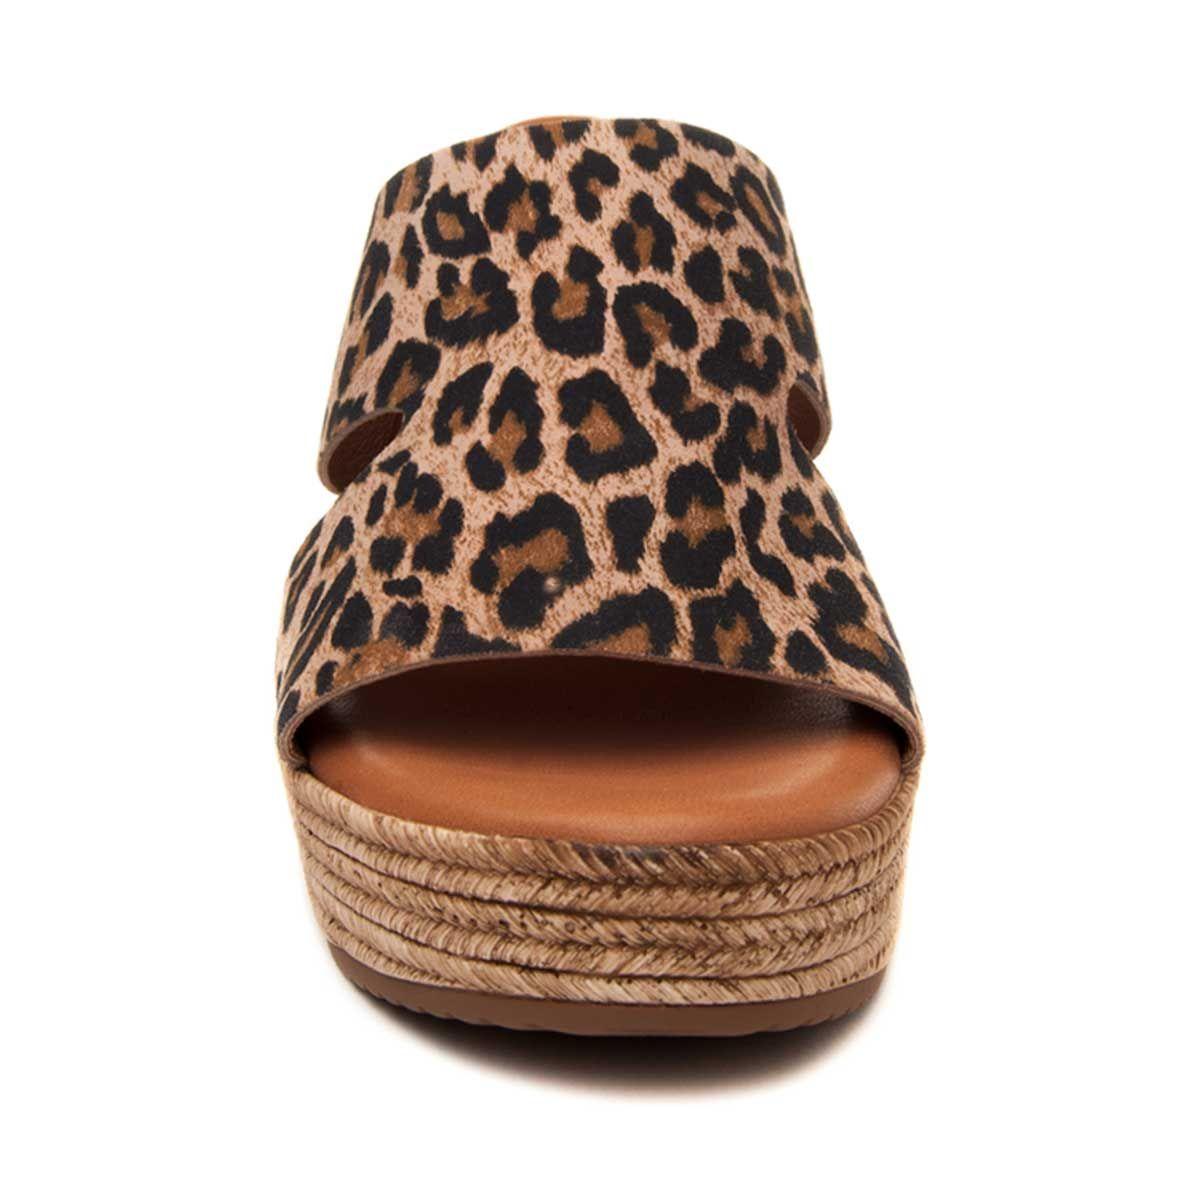 Montevita Platform Sandal in Brown